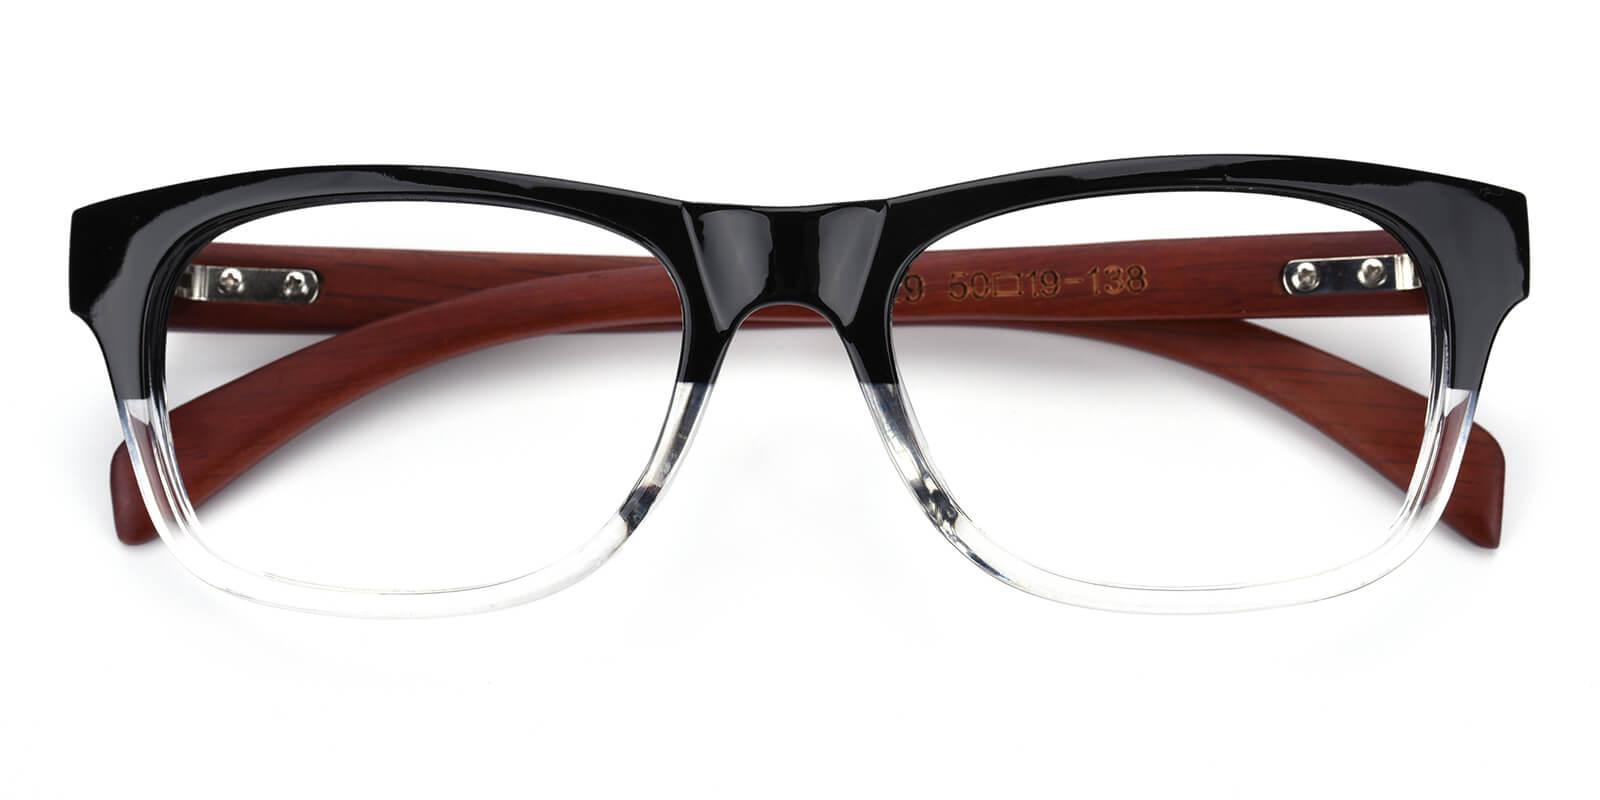 Intense-Multicolor-Square-Acetate-Eyeglasses-detail